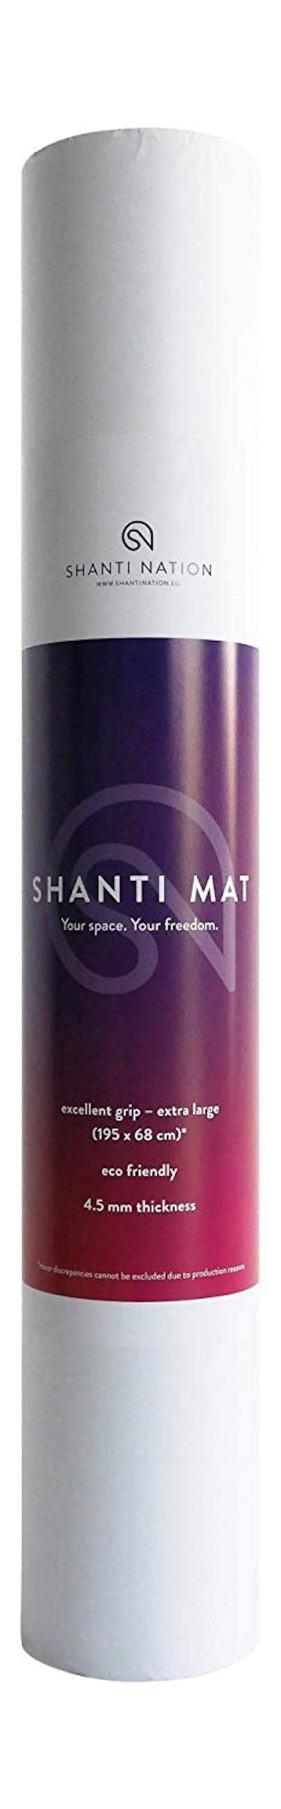 shanti-nation-pro-xl-yogamatte-test-5